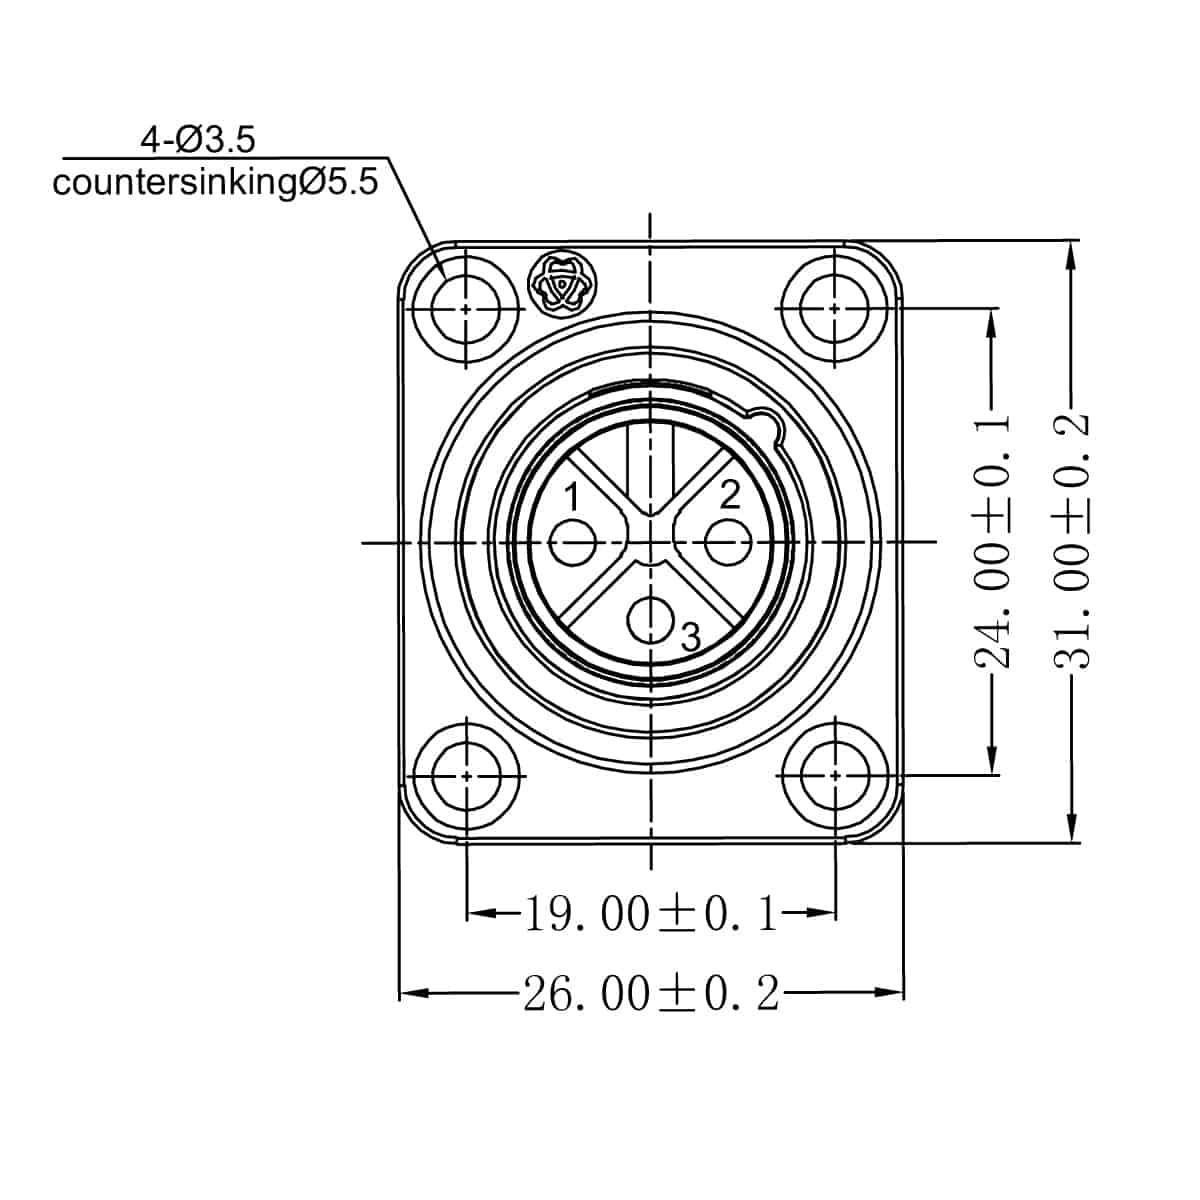 Enova Outdoor Xlr Built In Plug Ip67 3 Pin Solder